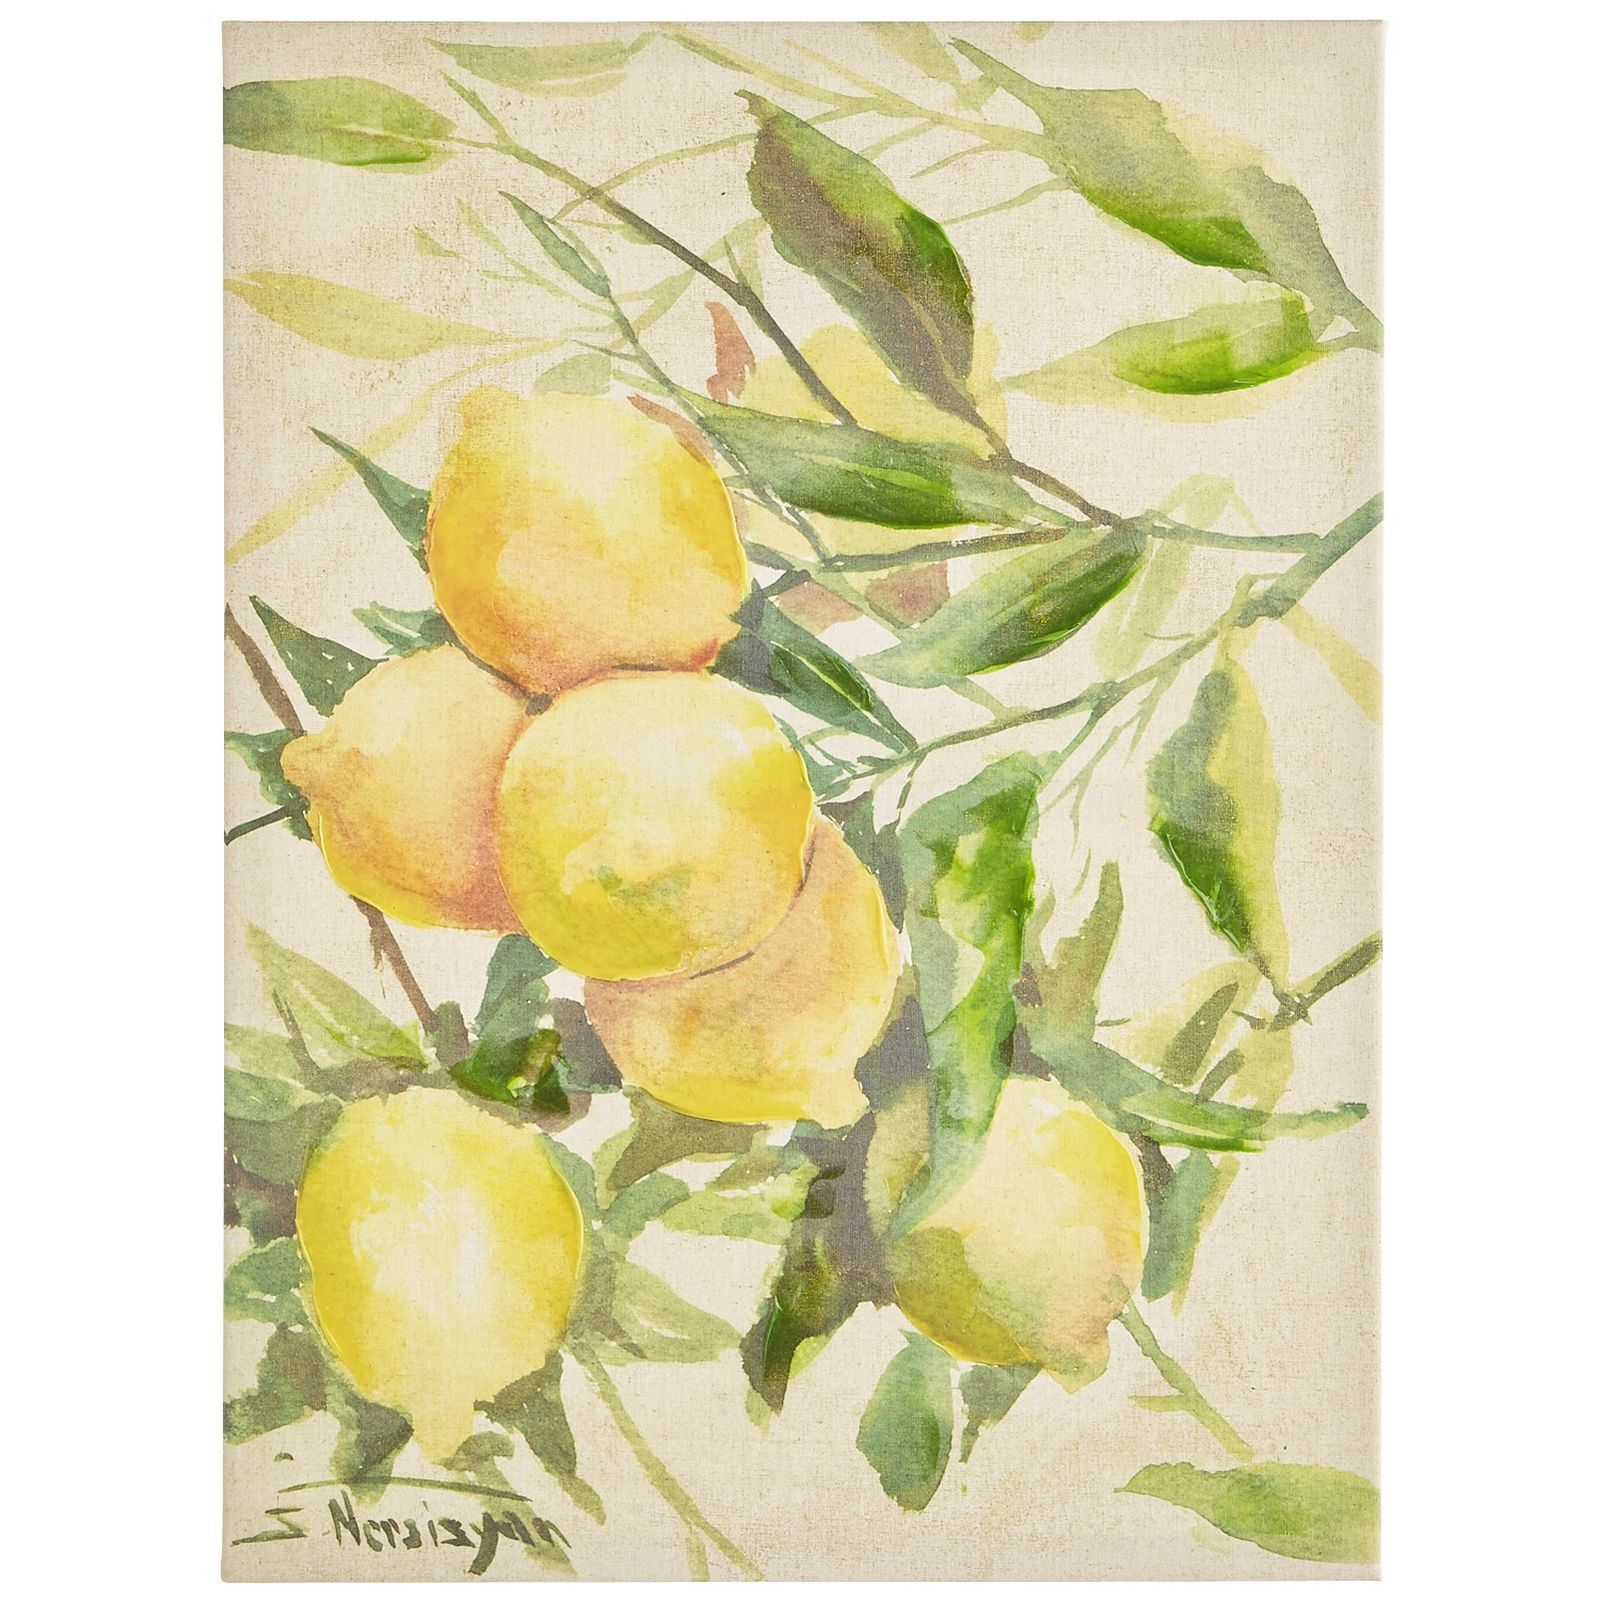 Lemons Art | Decor / Home Goods | Pinterest | Lemon art, Unique ...